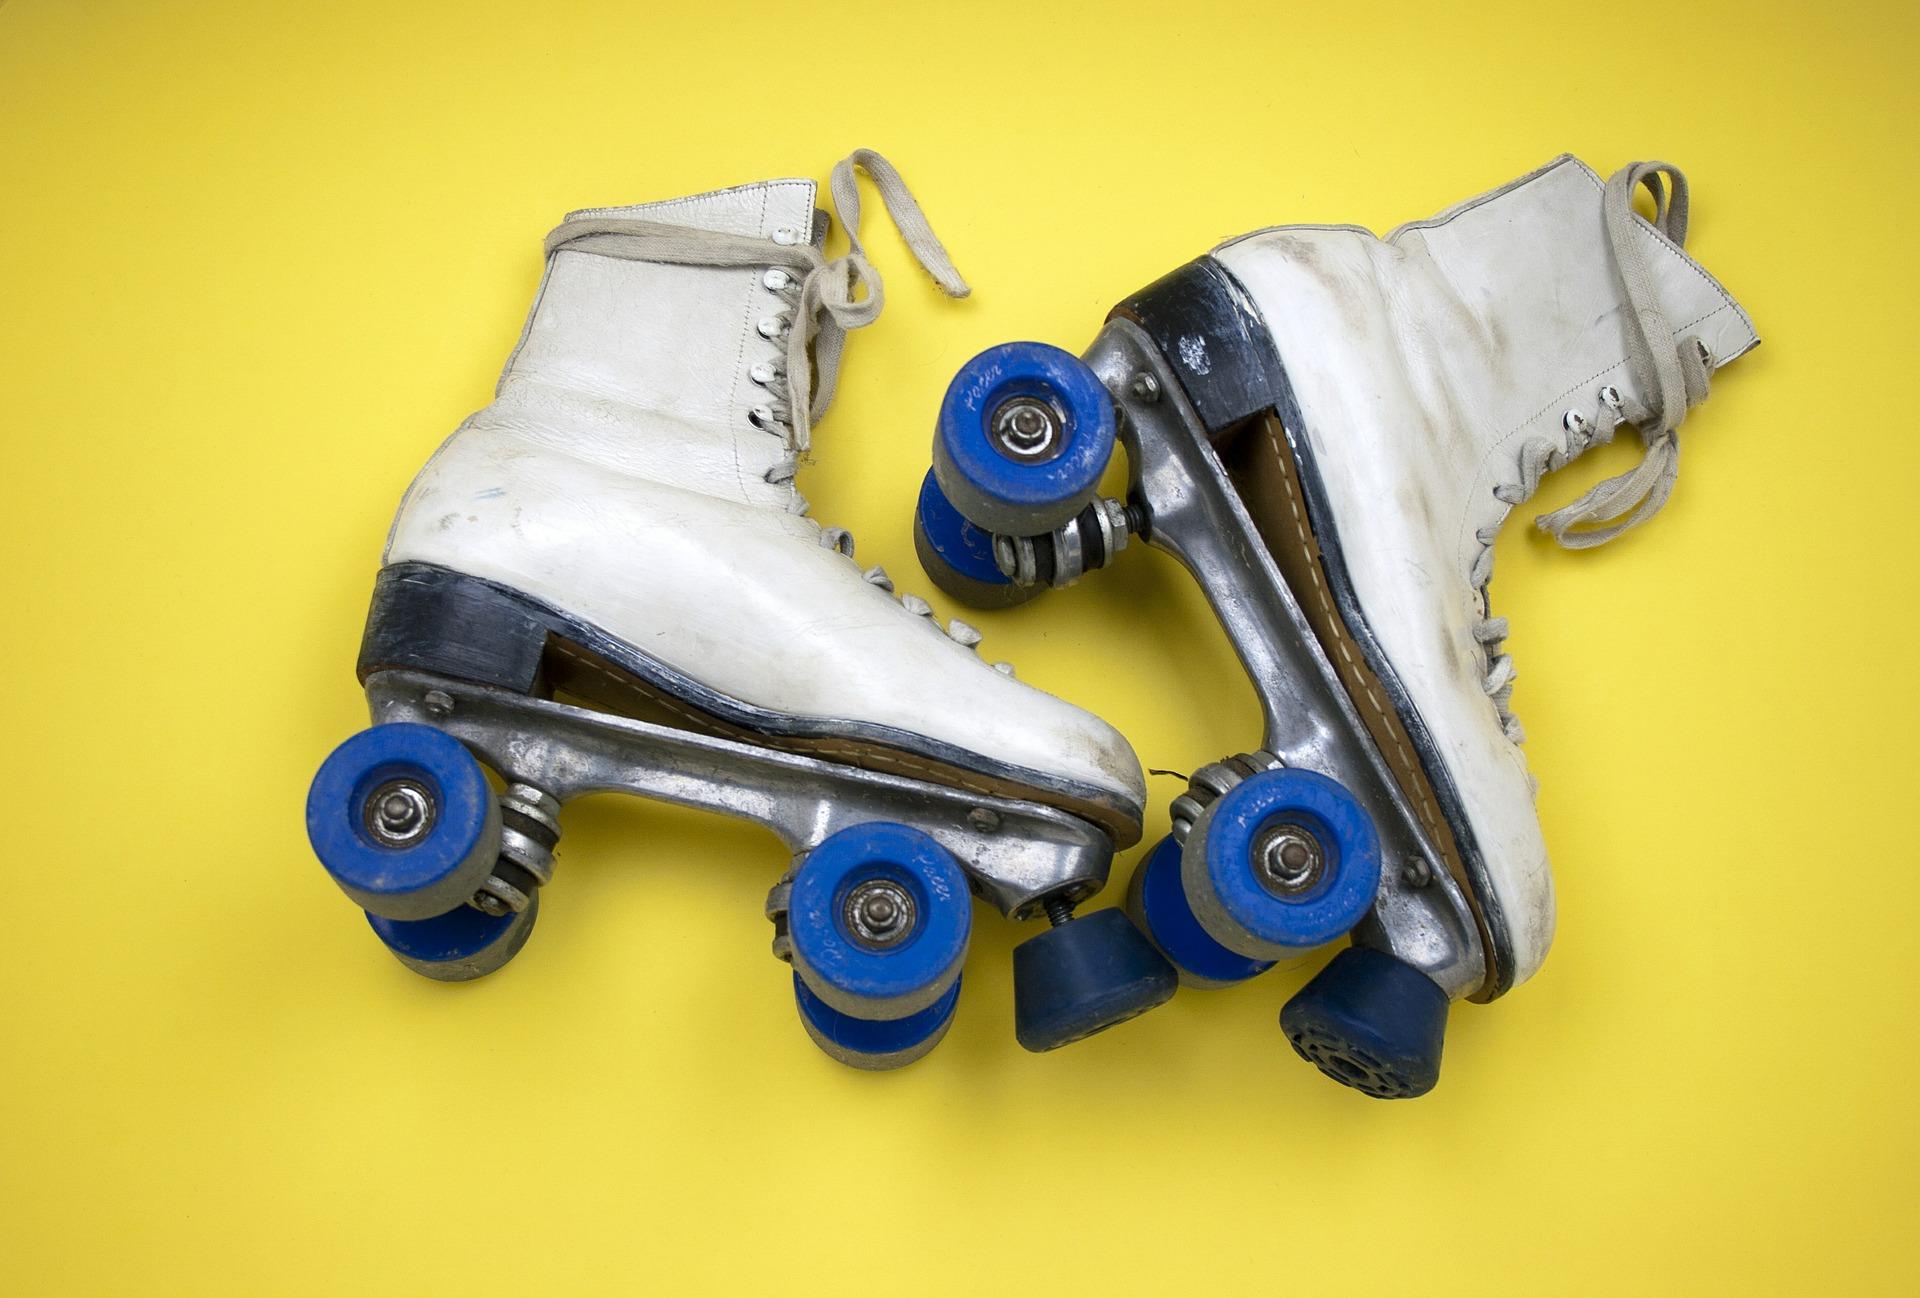 roller-skates-415389_1920 - Lindsay Leslie.jpg